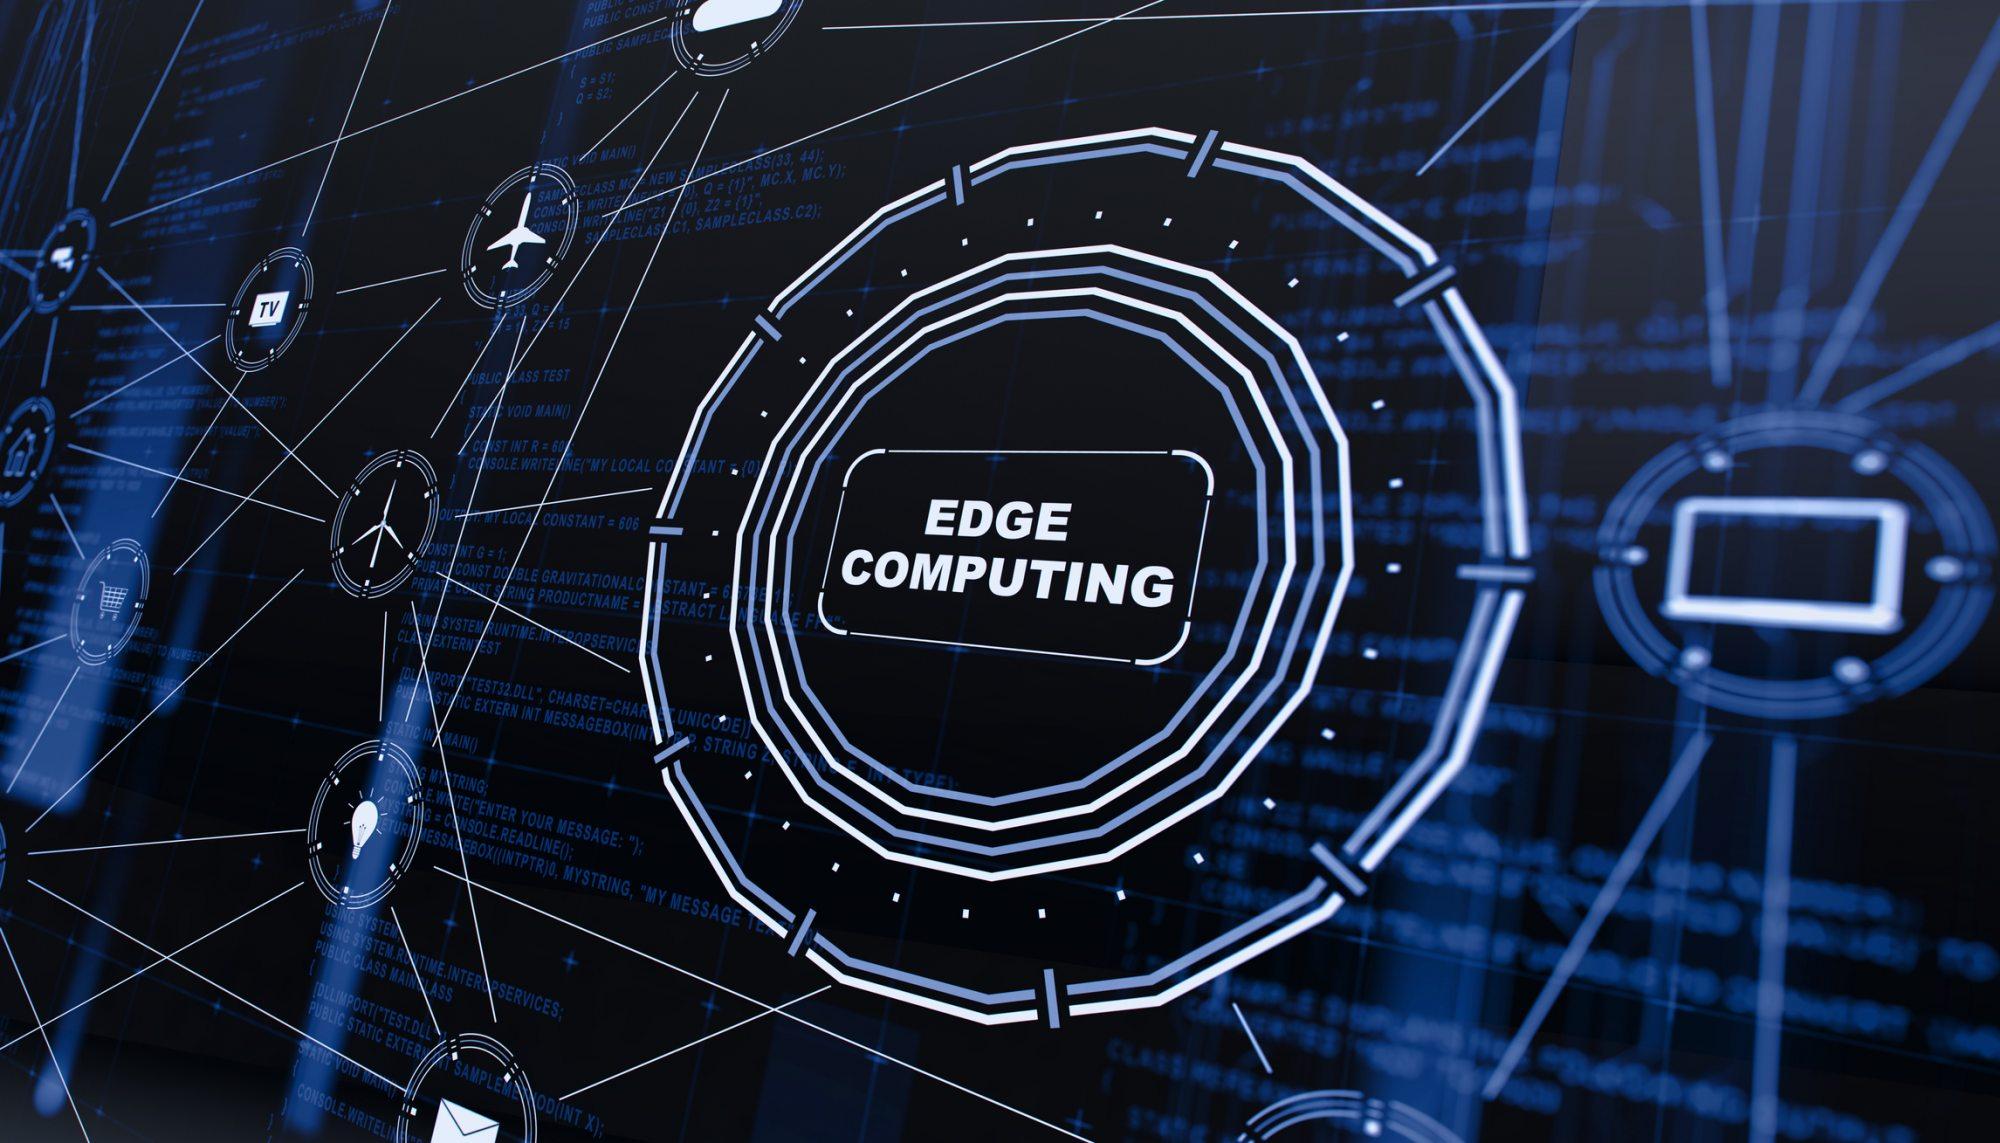 Edge computing 3D displayed